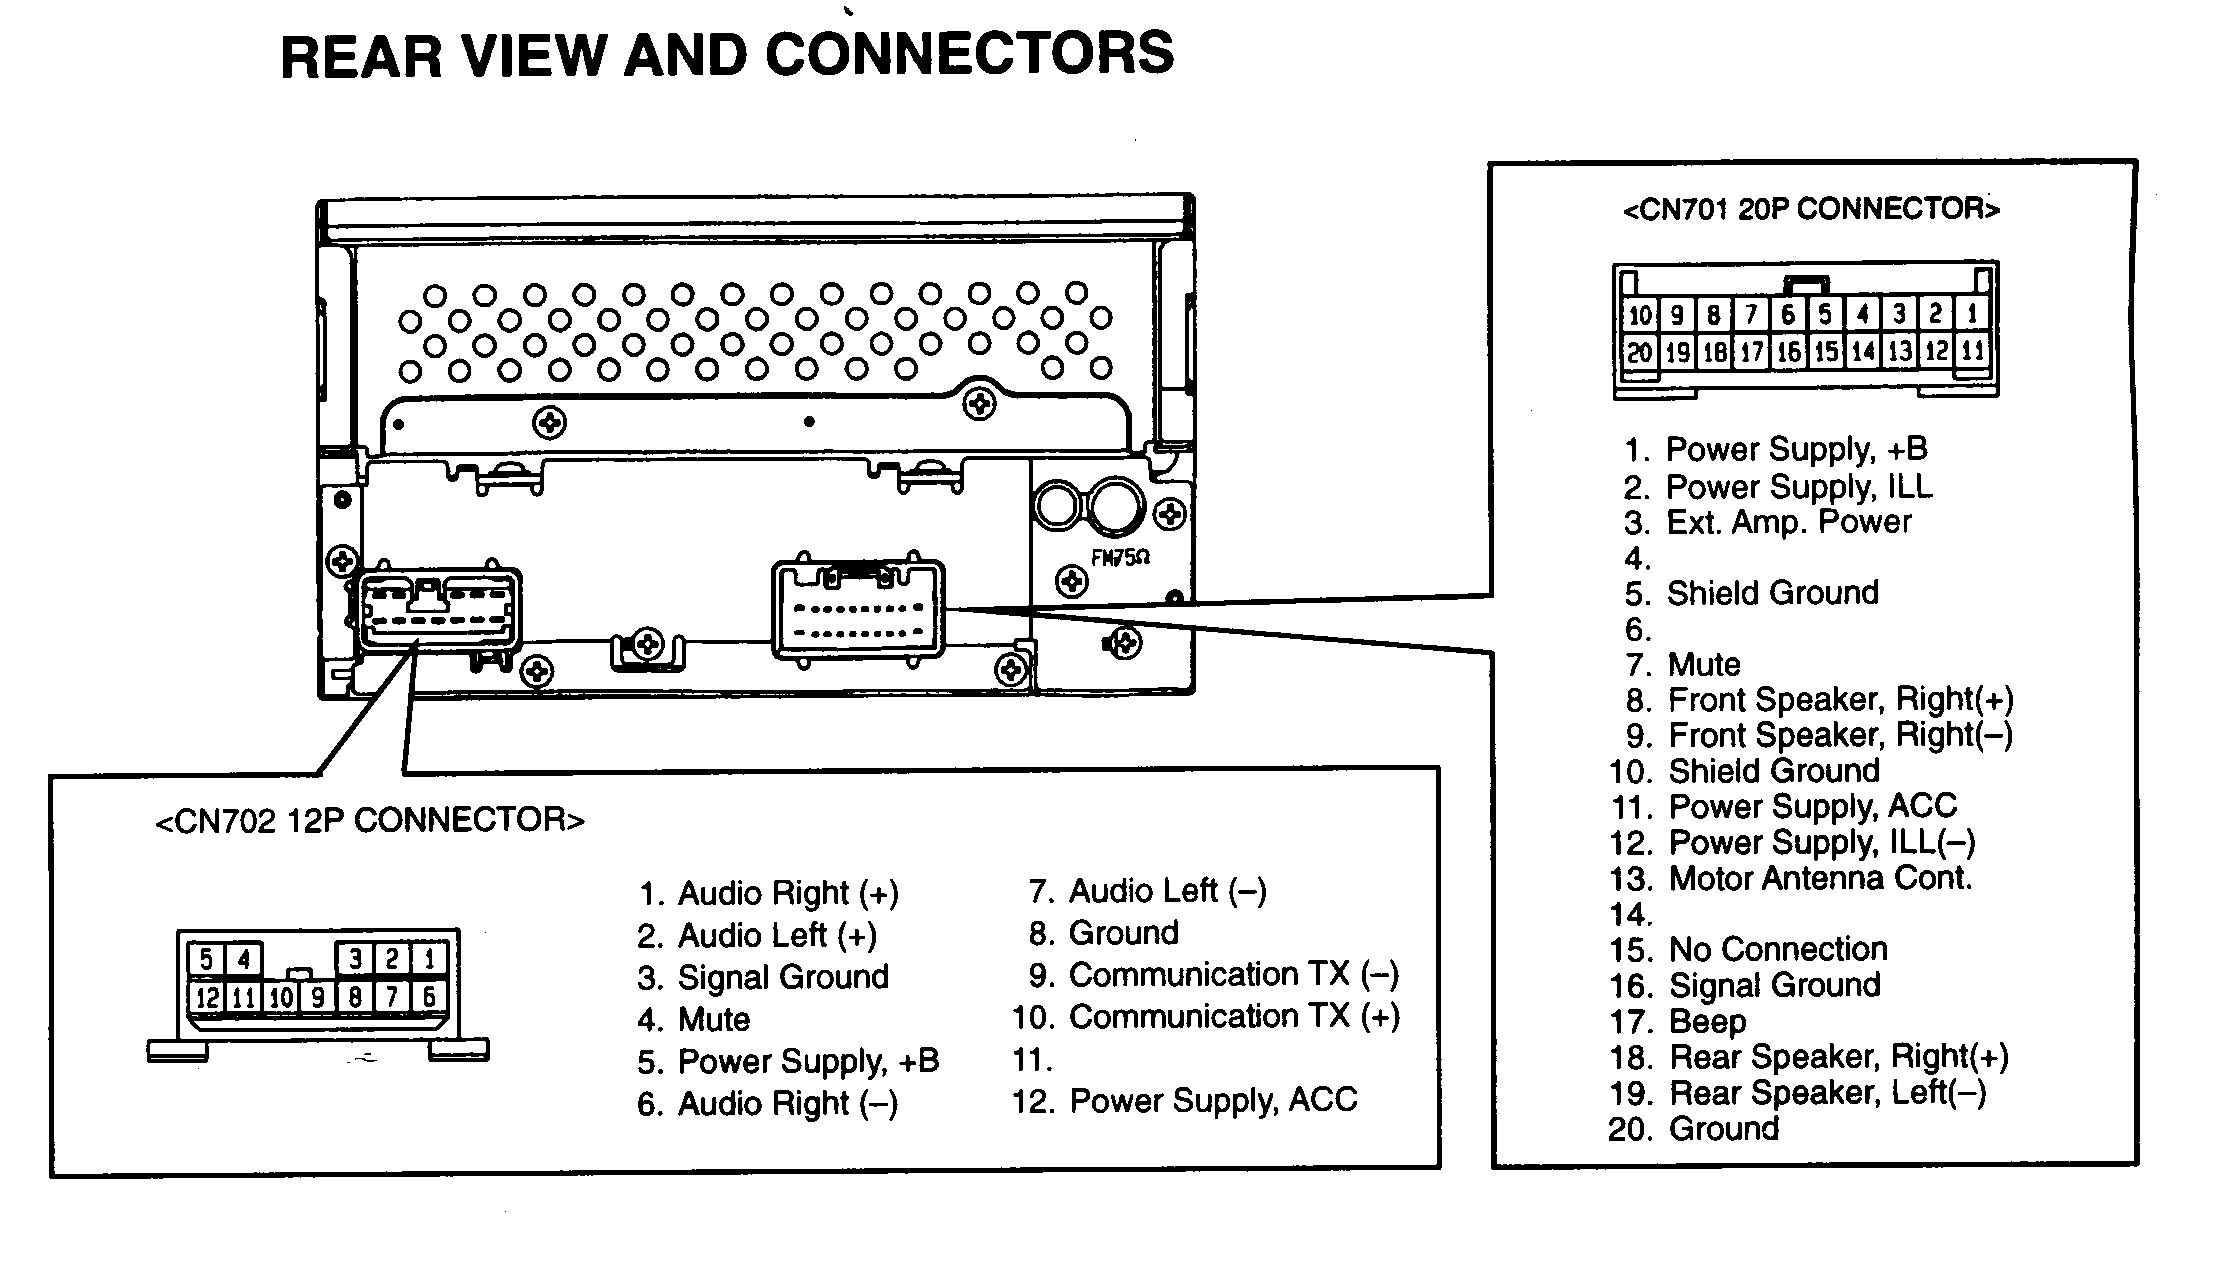 Toyota Car Stereo Wiring - Wiring Diagram Data Oreo - Car Amp Wiring Diagram